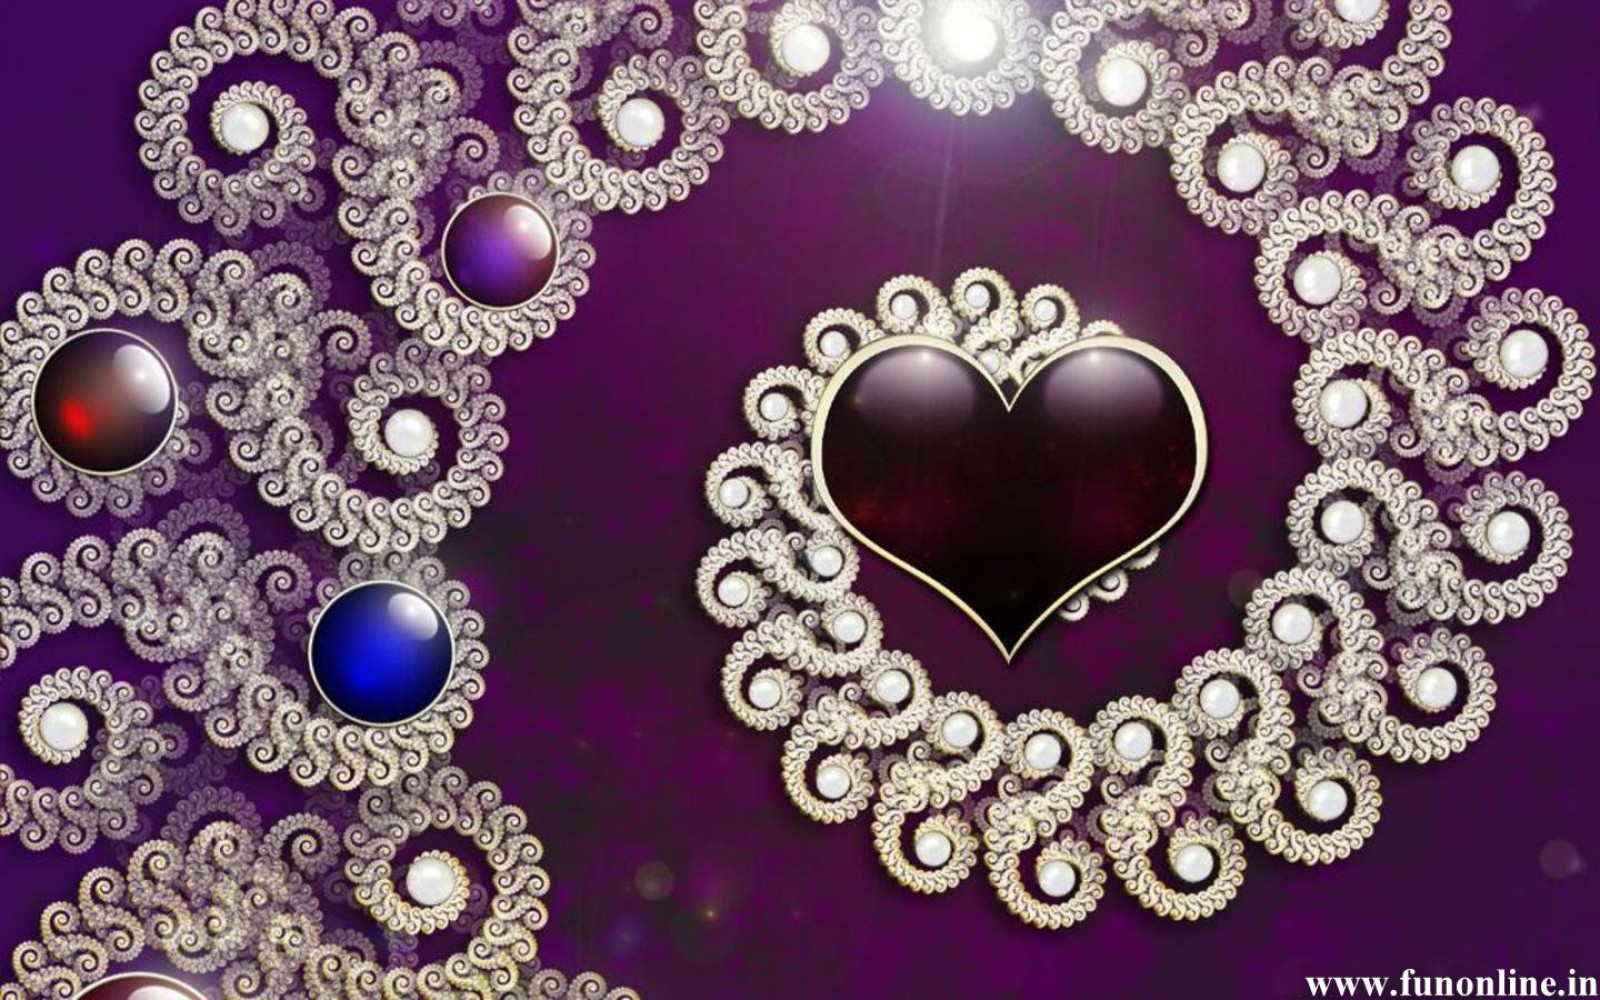 Free Download Best Love Wallpapers Download Best Love Hd